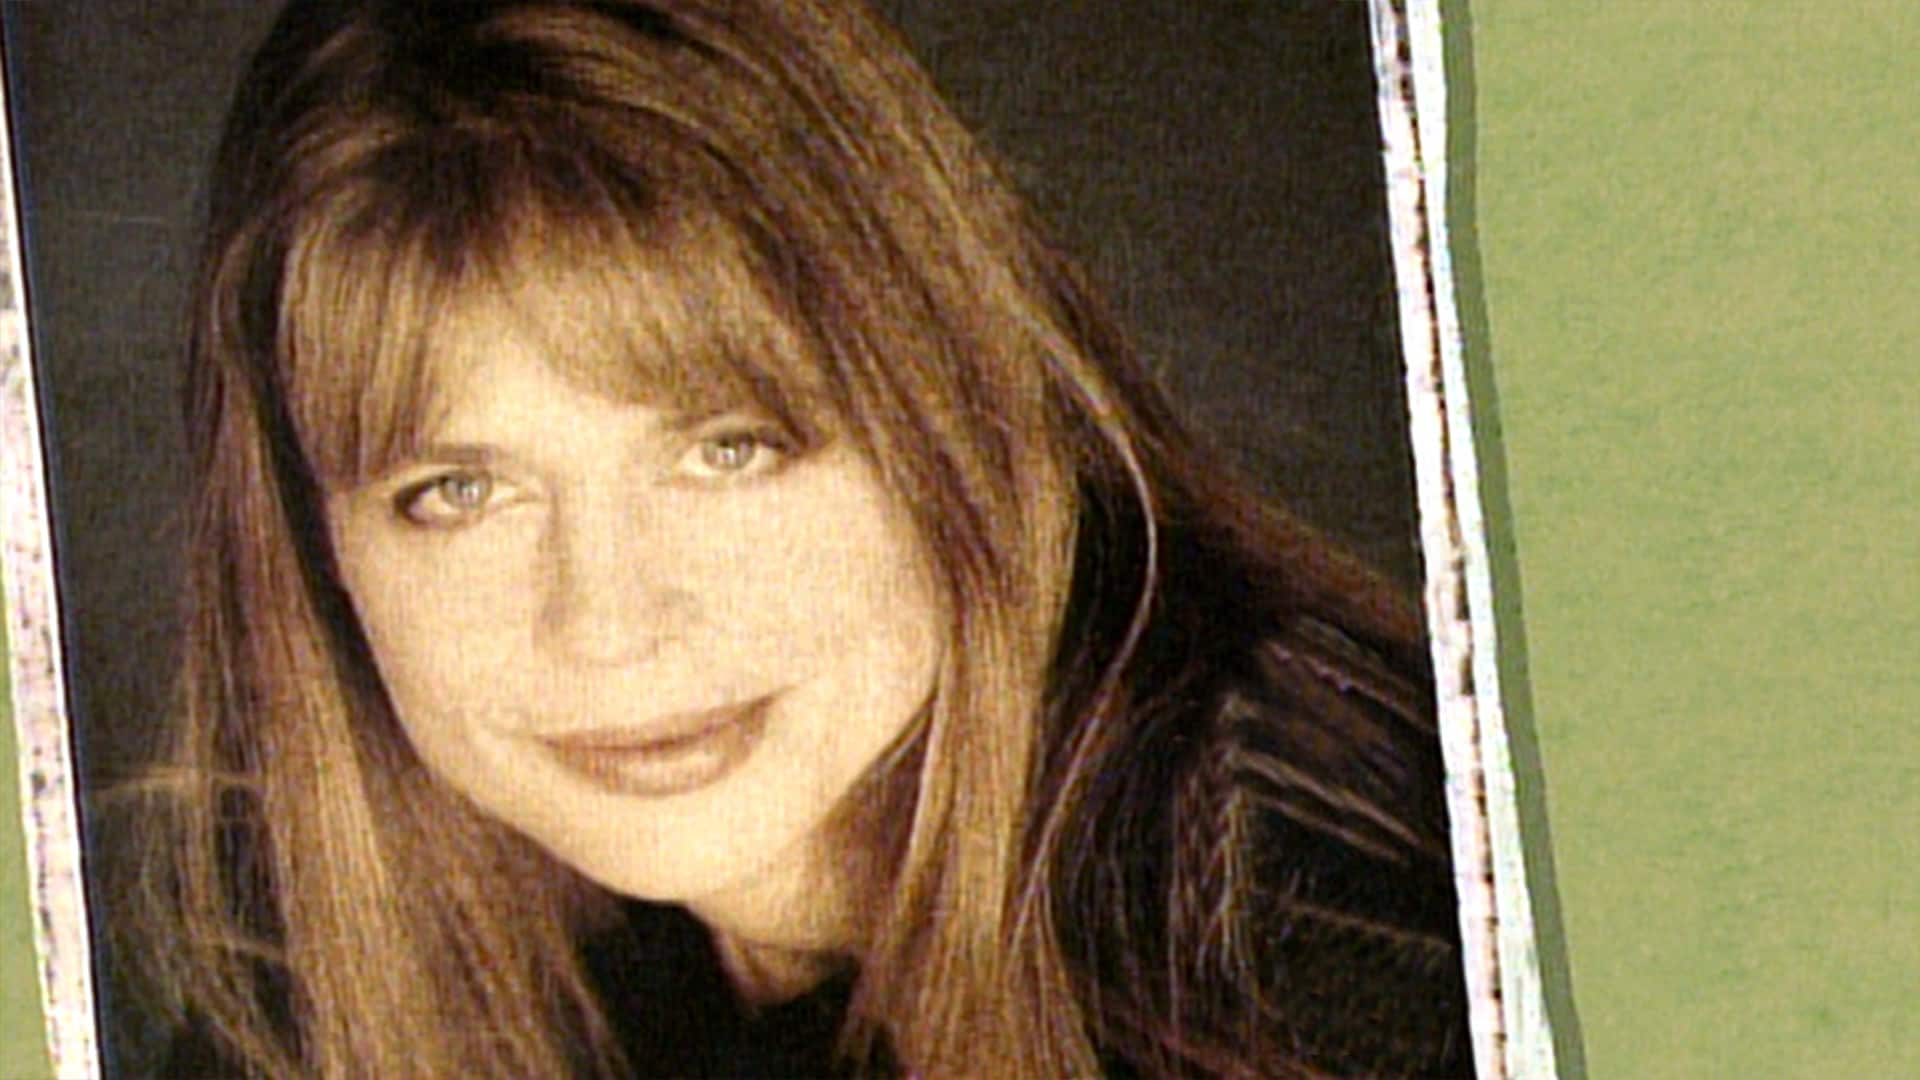 Linda Hamilton: November 16, 1991